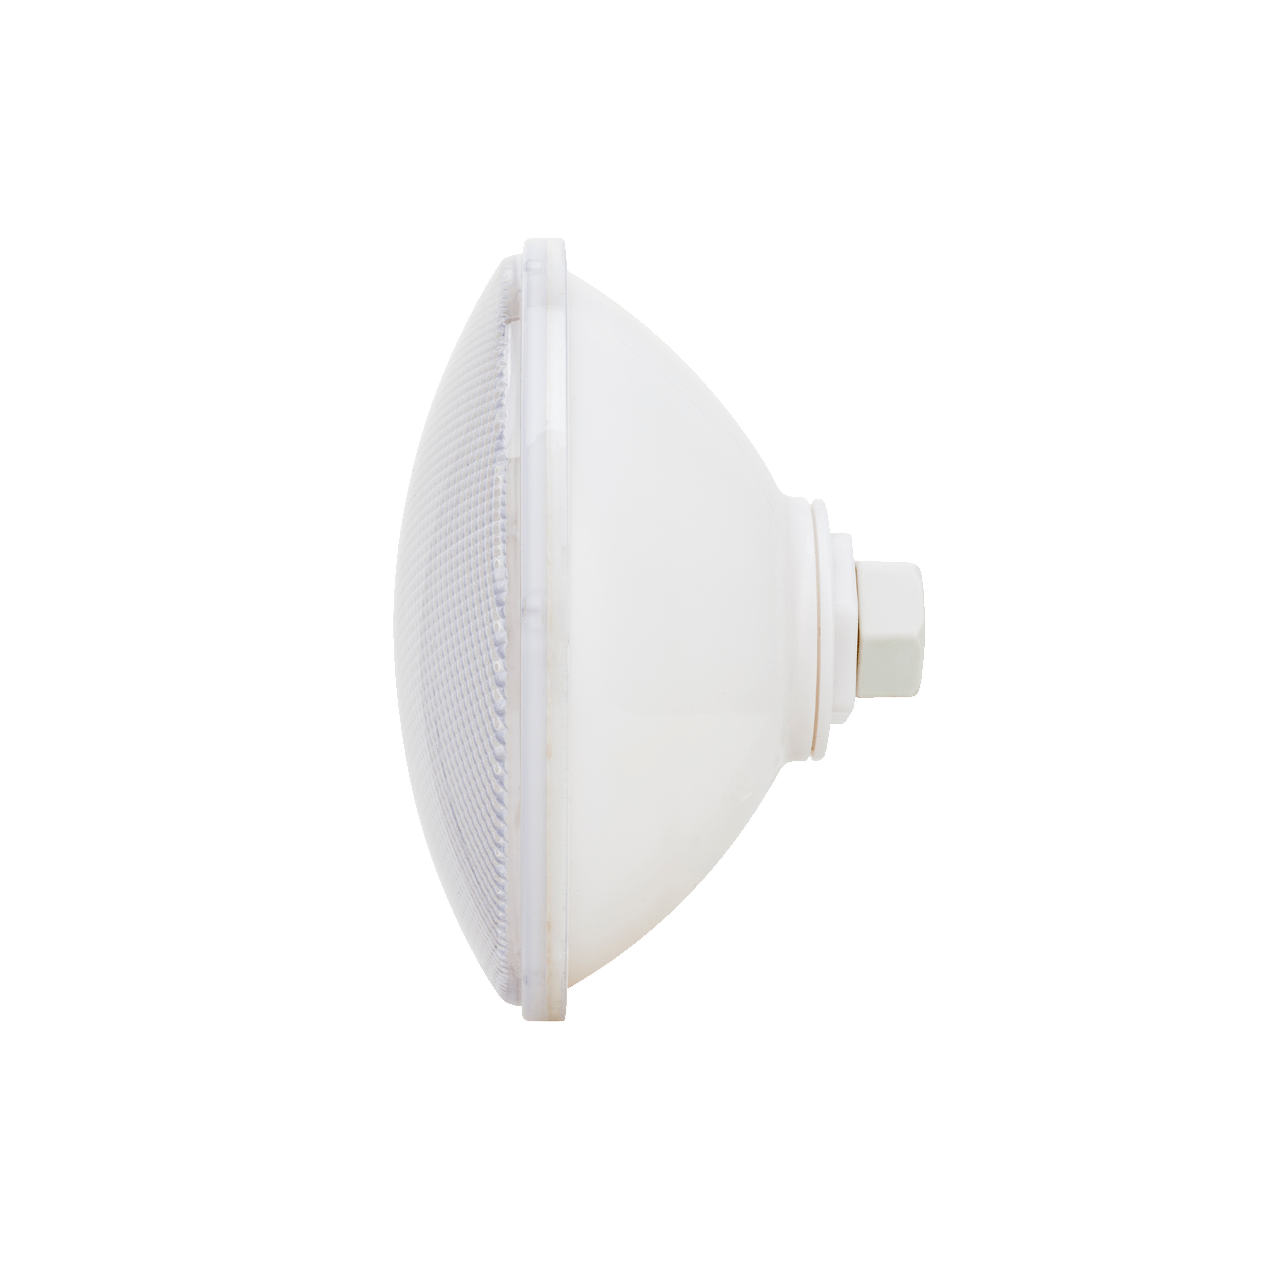 BWT LED Glühbirne Standard LEDINPOOL mit Farblicht LEDs